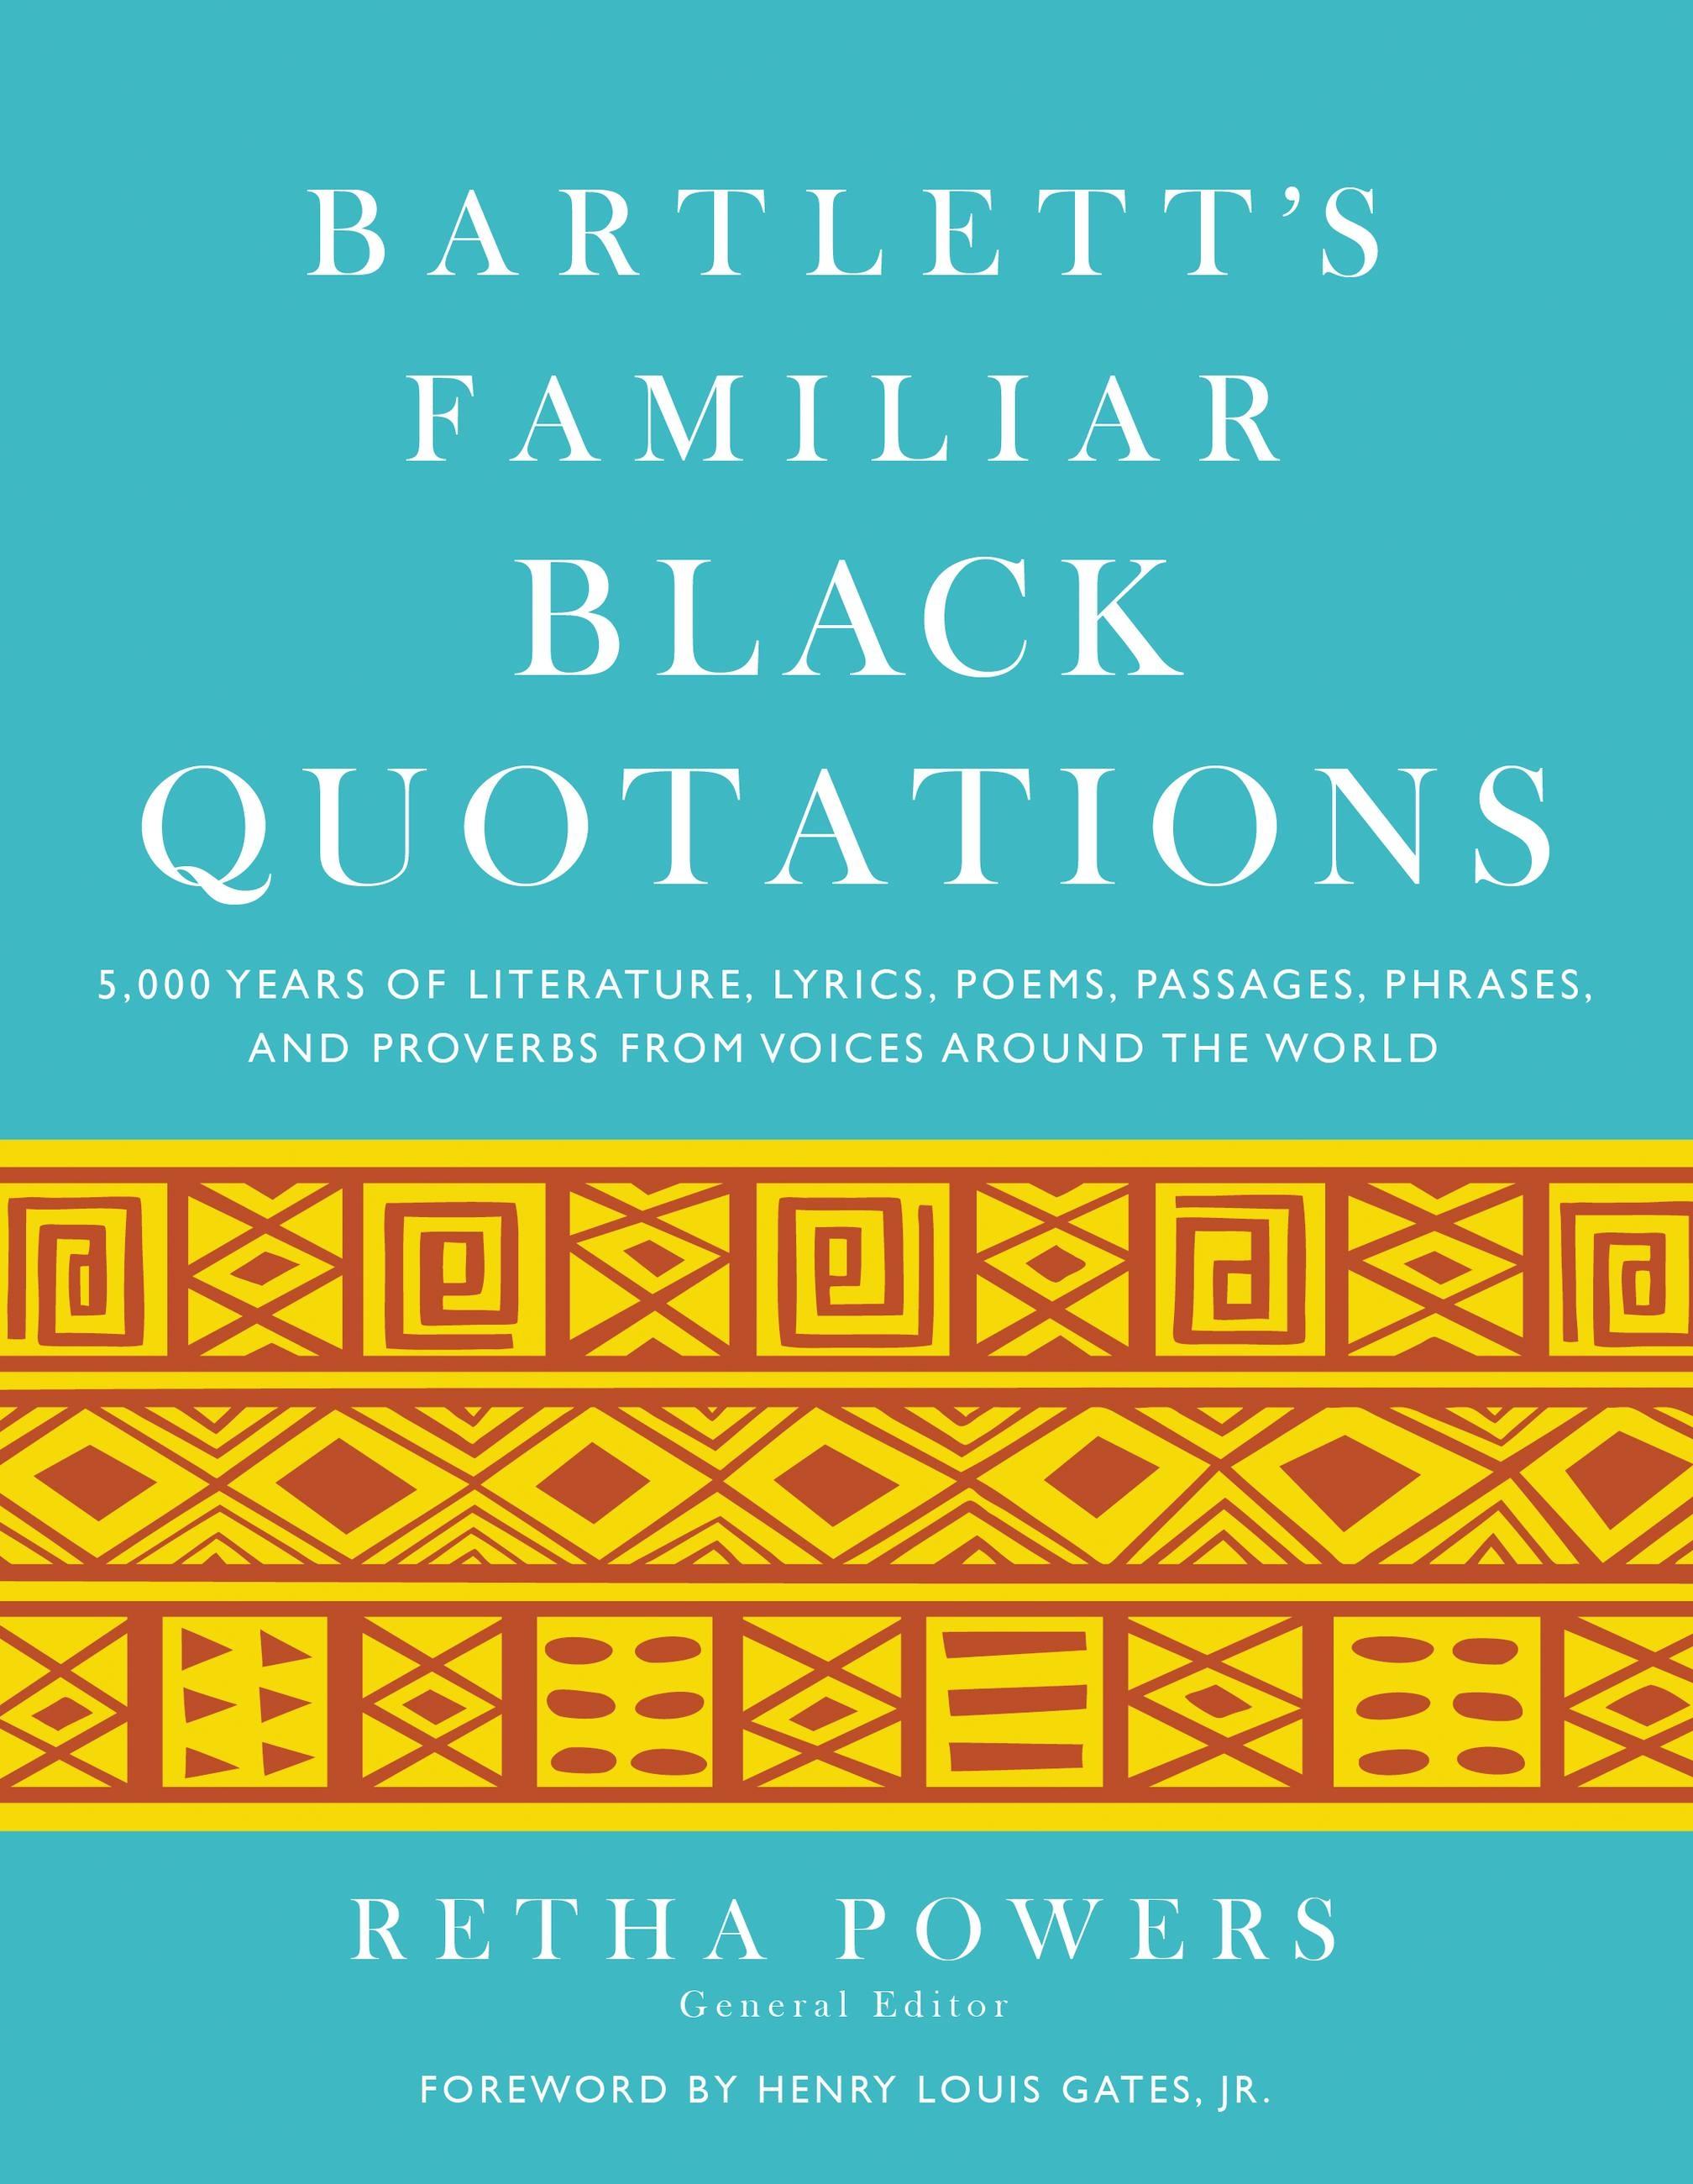 Bartlett's Familiar Black Quotations by Retha Powers ...